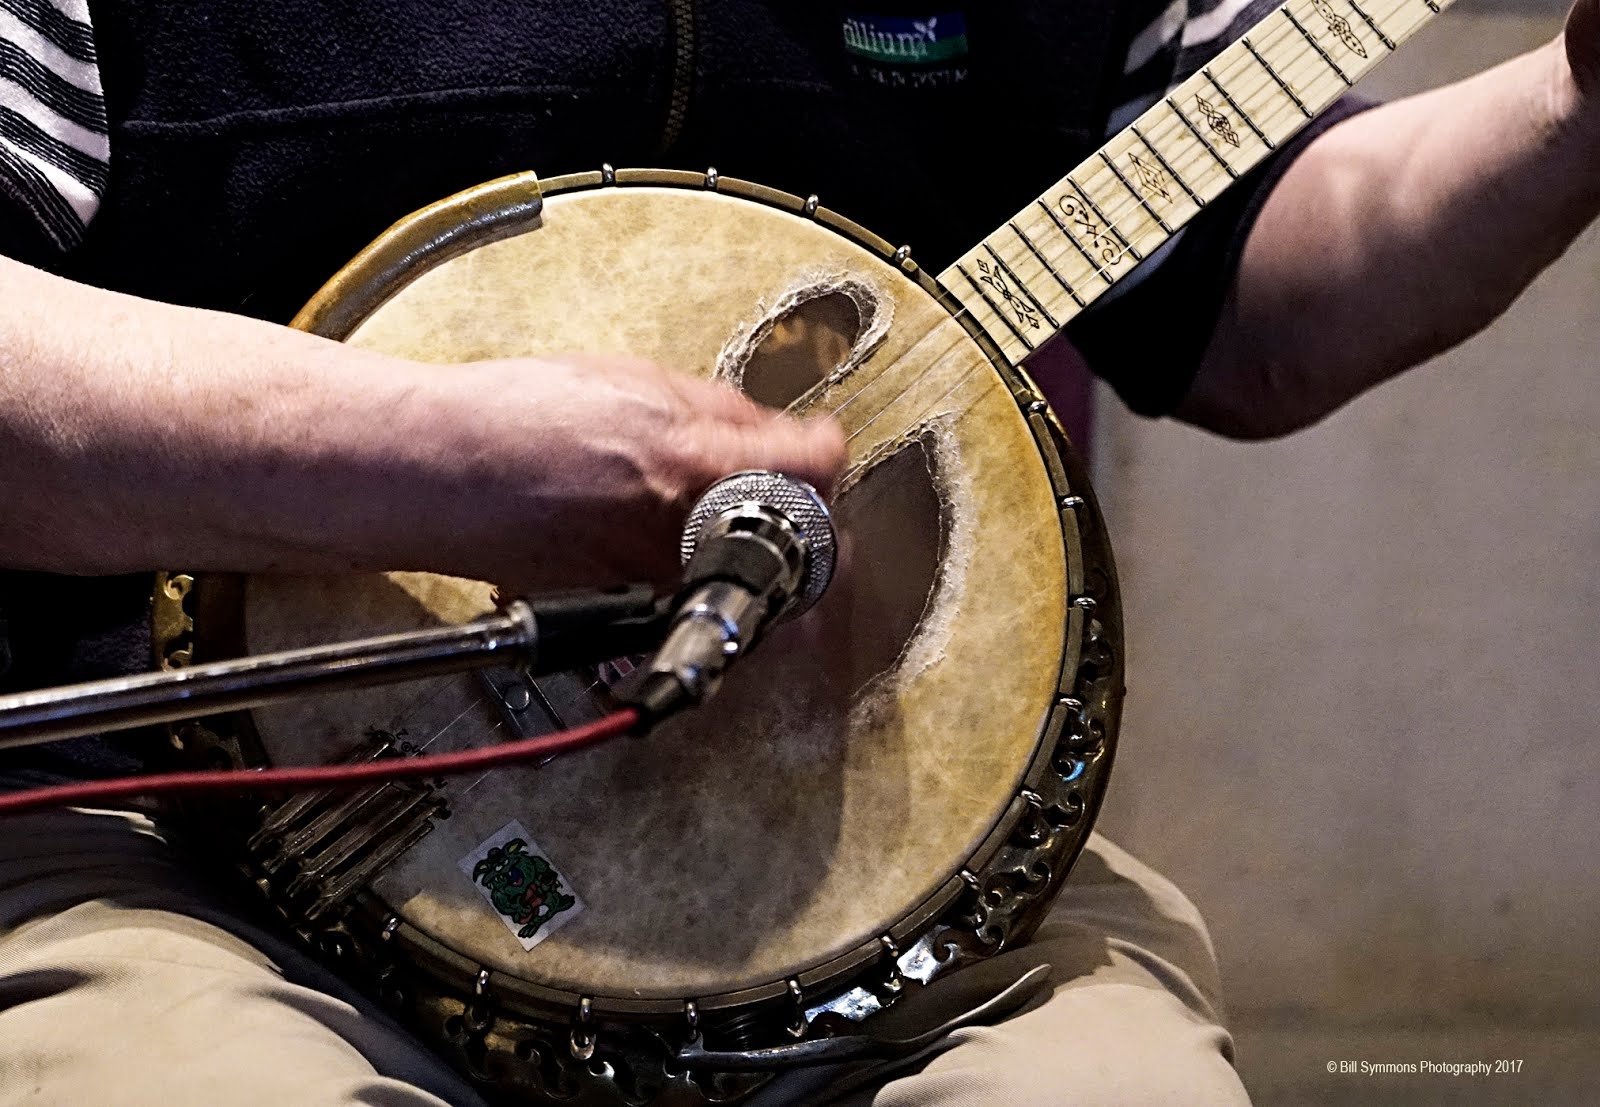 Doc Walmsley's Battered Banjo